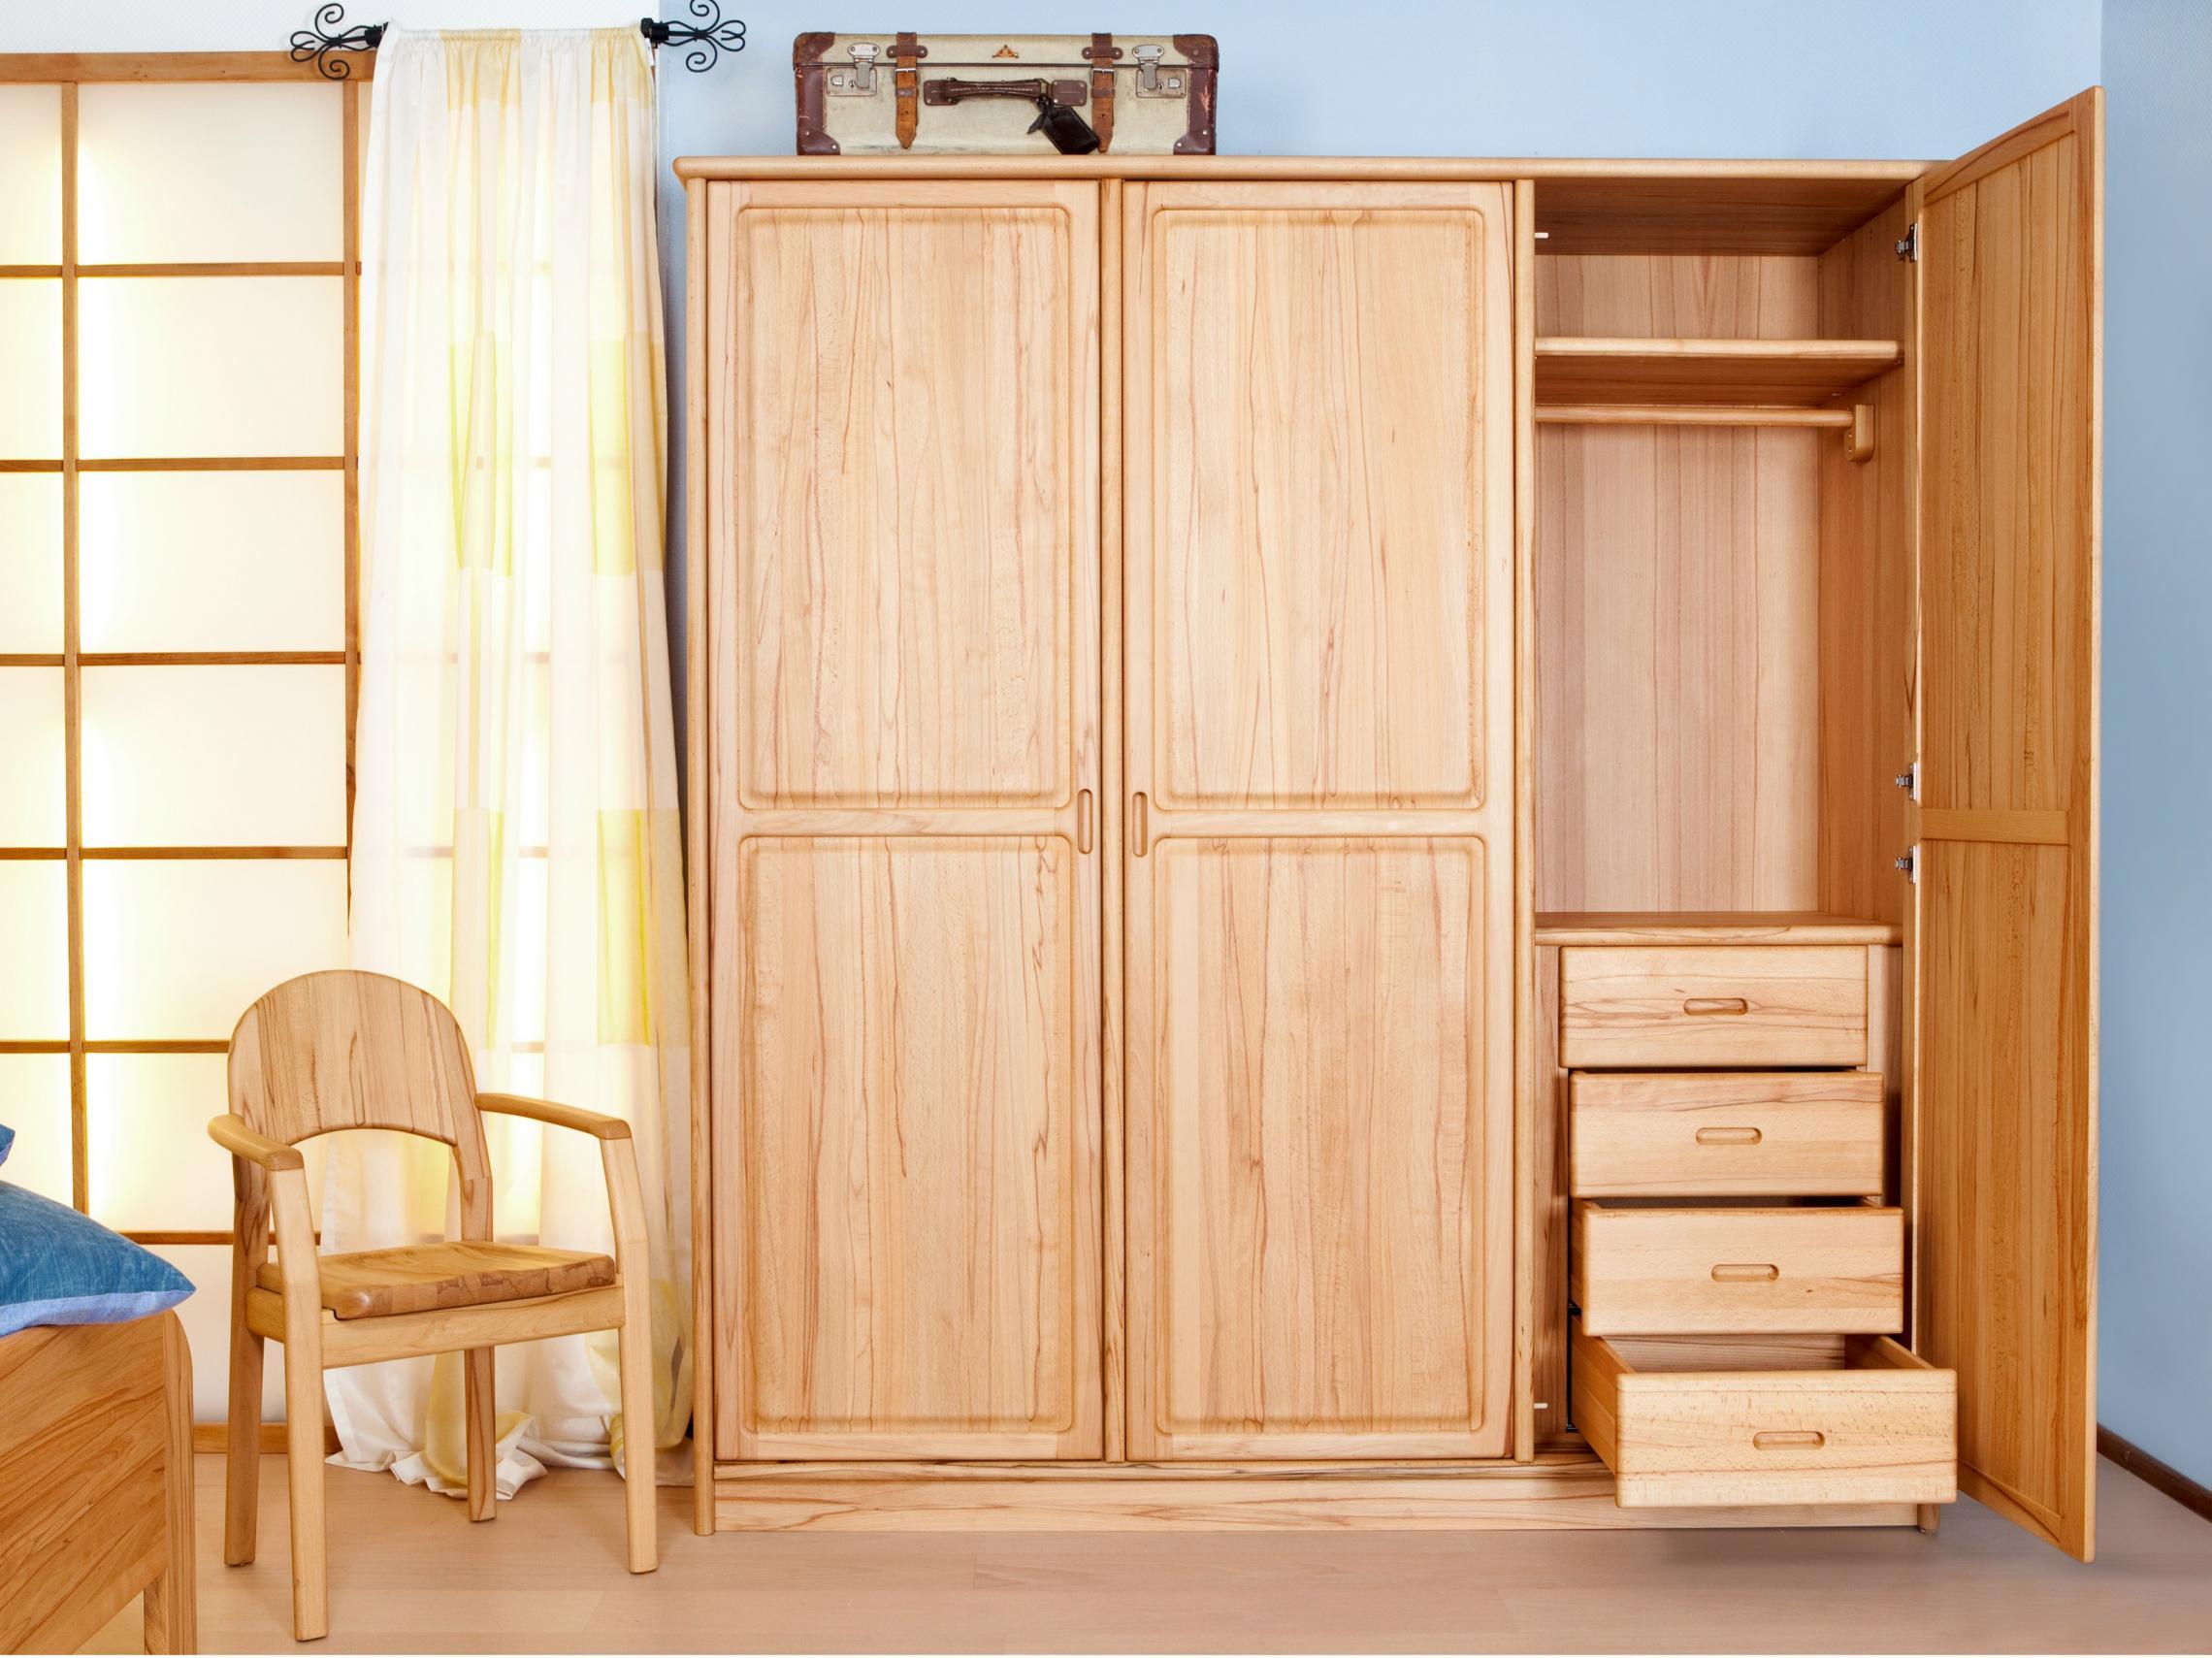 صور غرف ملابس خشب طبيعي